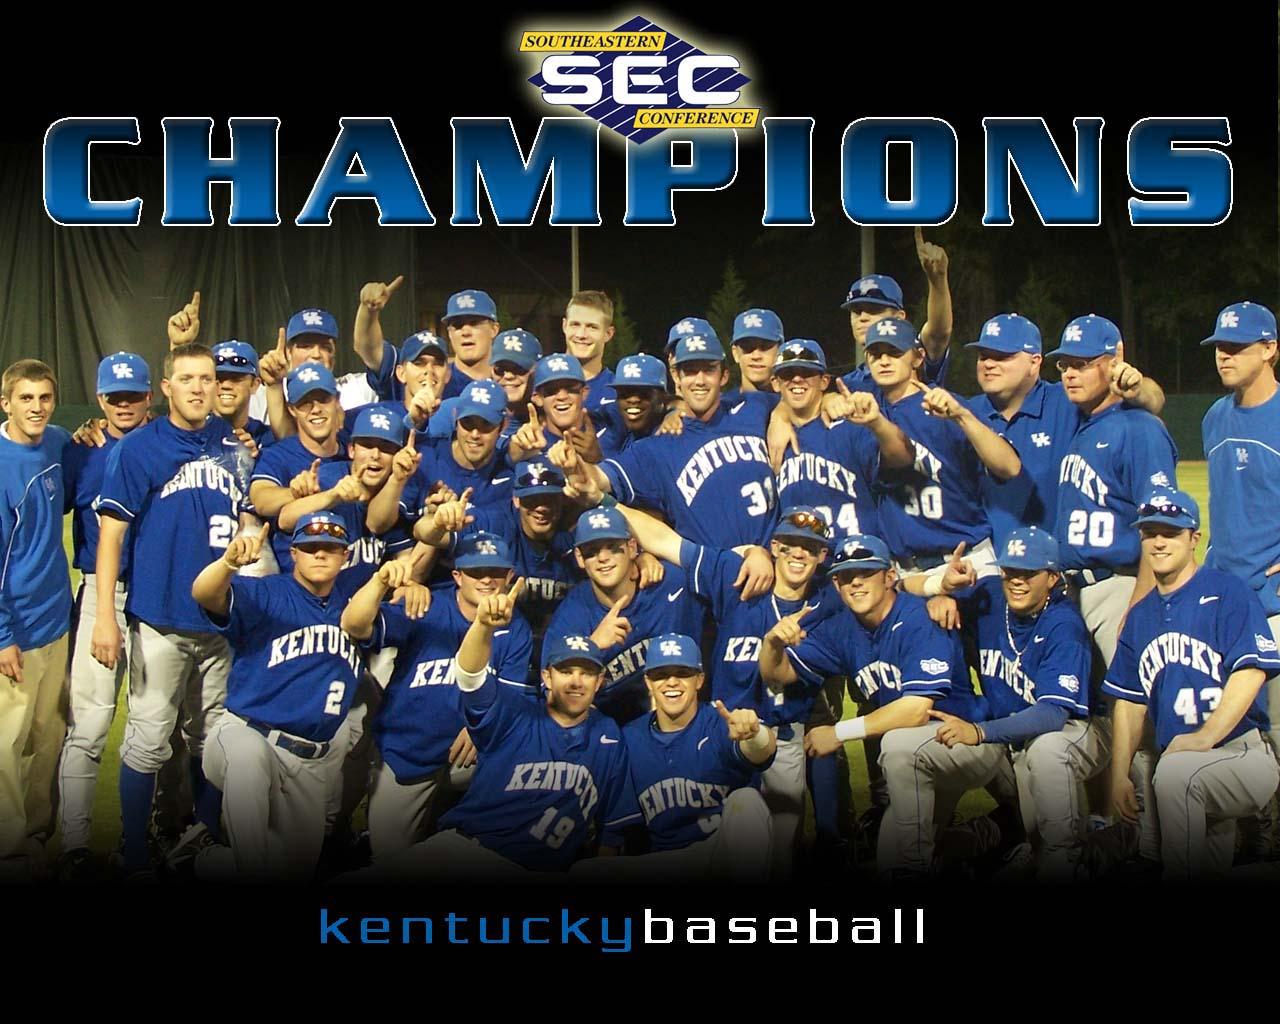 Kentucky Basketball iPhone Wallpaper - WallpaperSafari